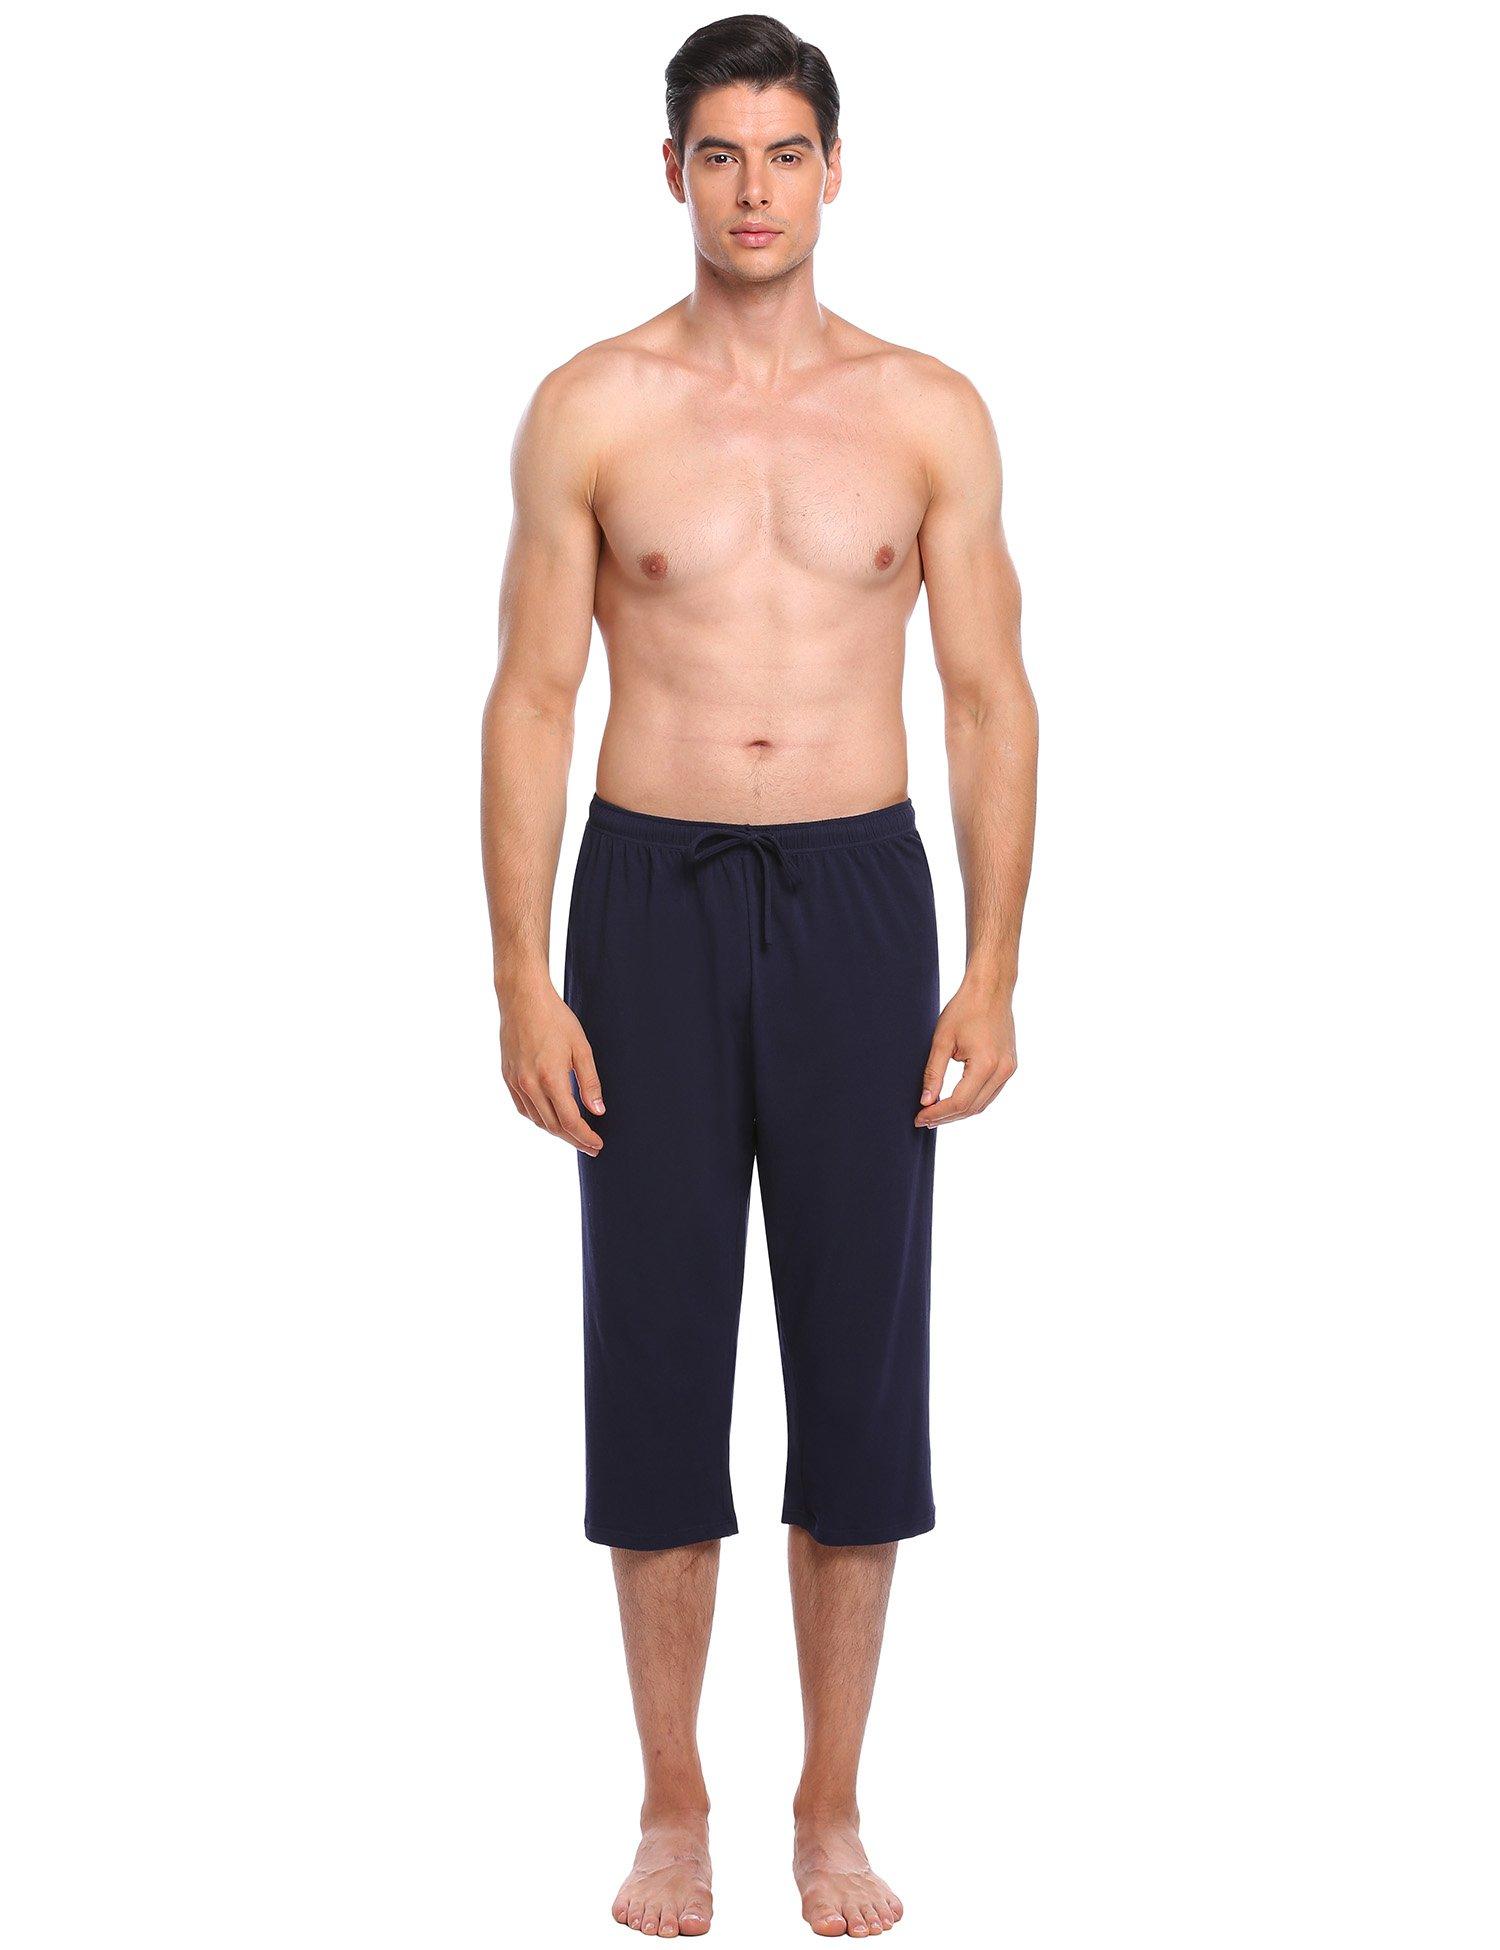 L'amore Men's Casual Comfortable Solid Pocket Lounge Elastic Drawstring Waistband Shorts